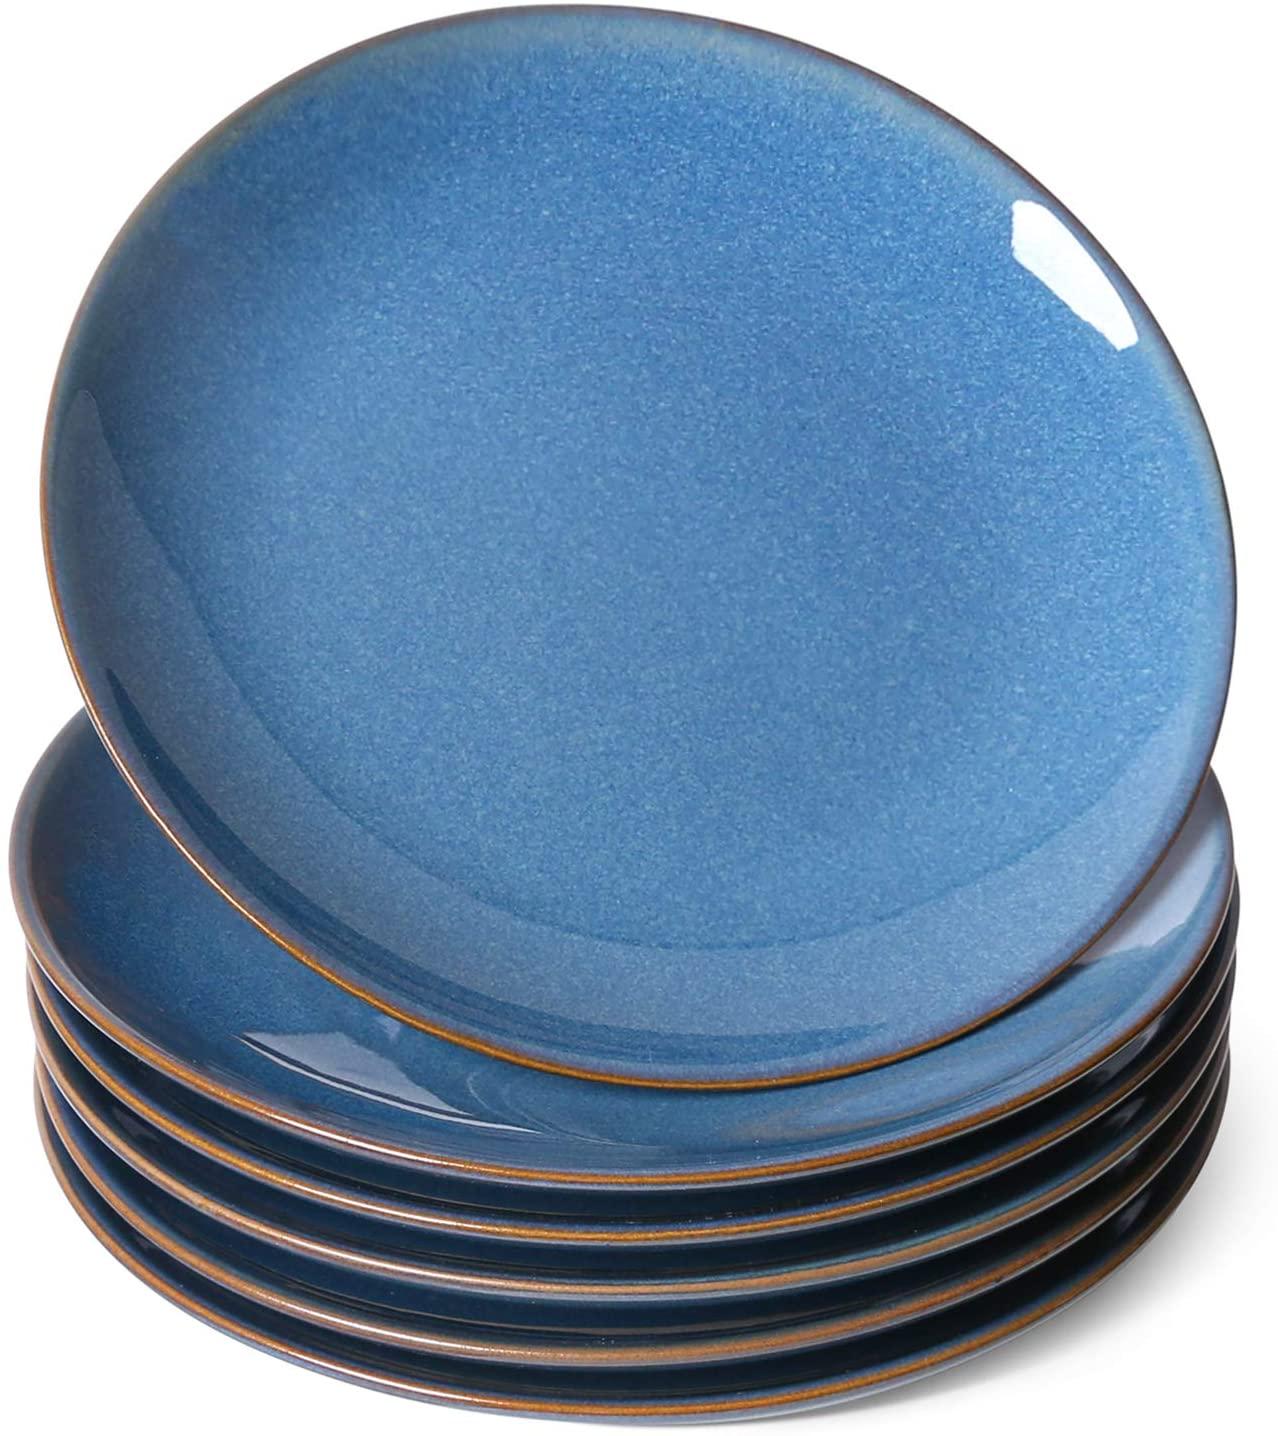 LE TAUCI 8.5 Inch Salad Plates, Ceramic Reactive Glaze Dessert Plate Set 6 Piece, Appetizers Dishes Set of 6, Ceylon Blue